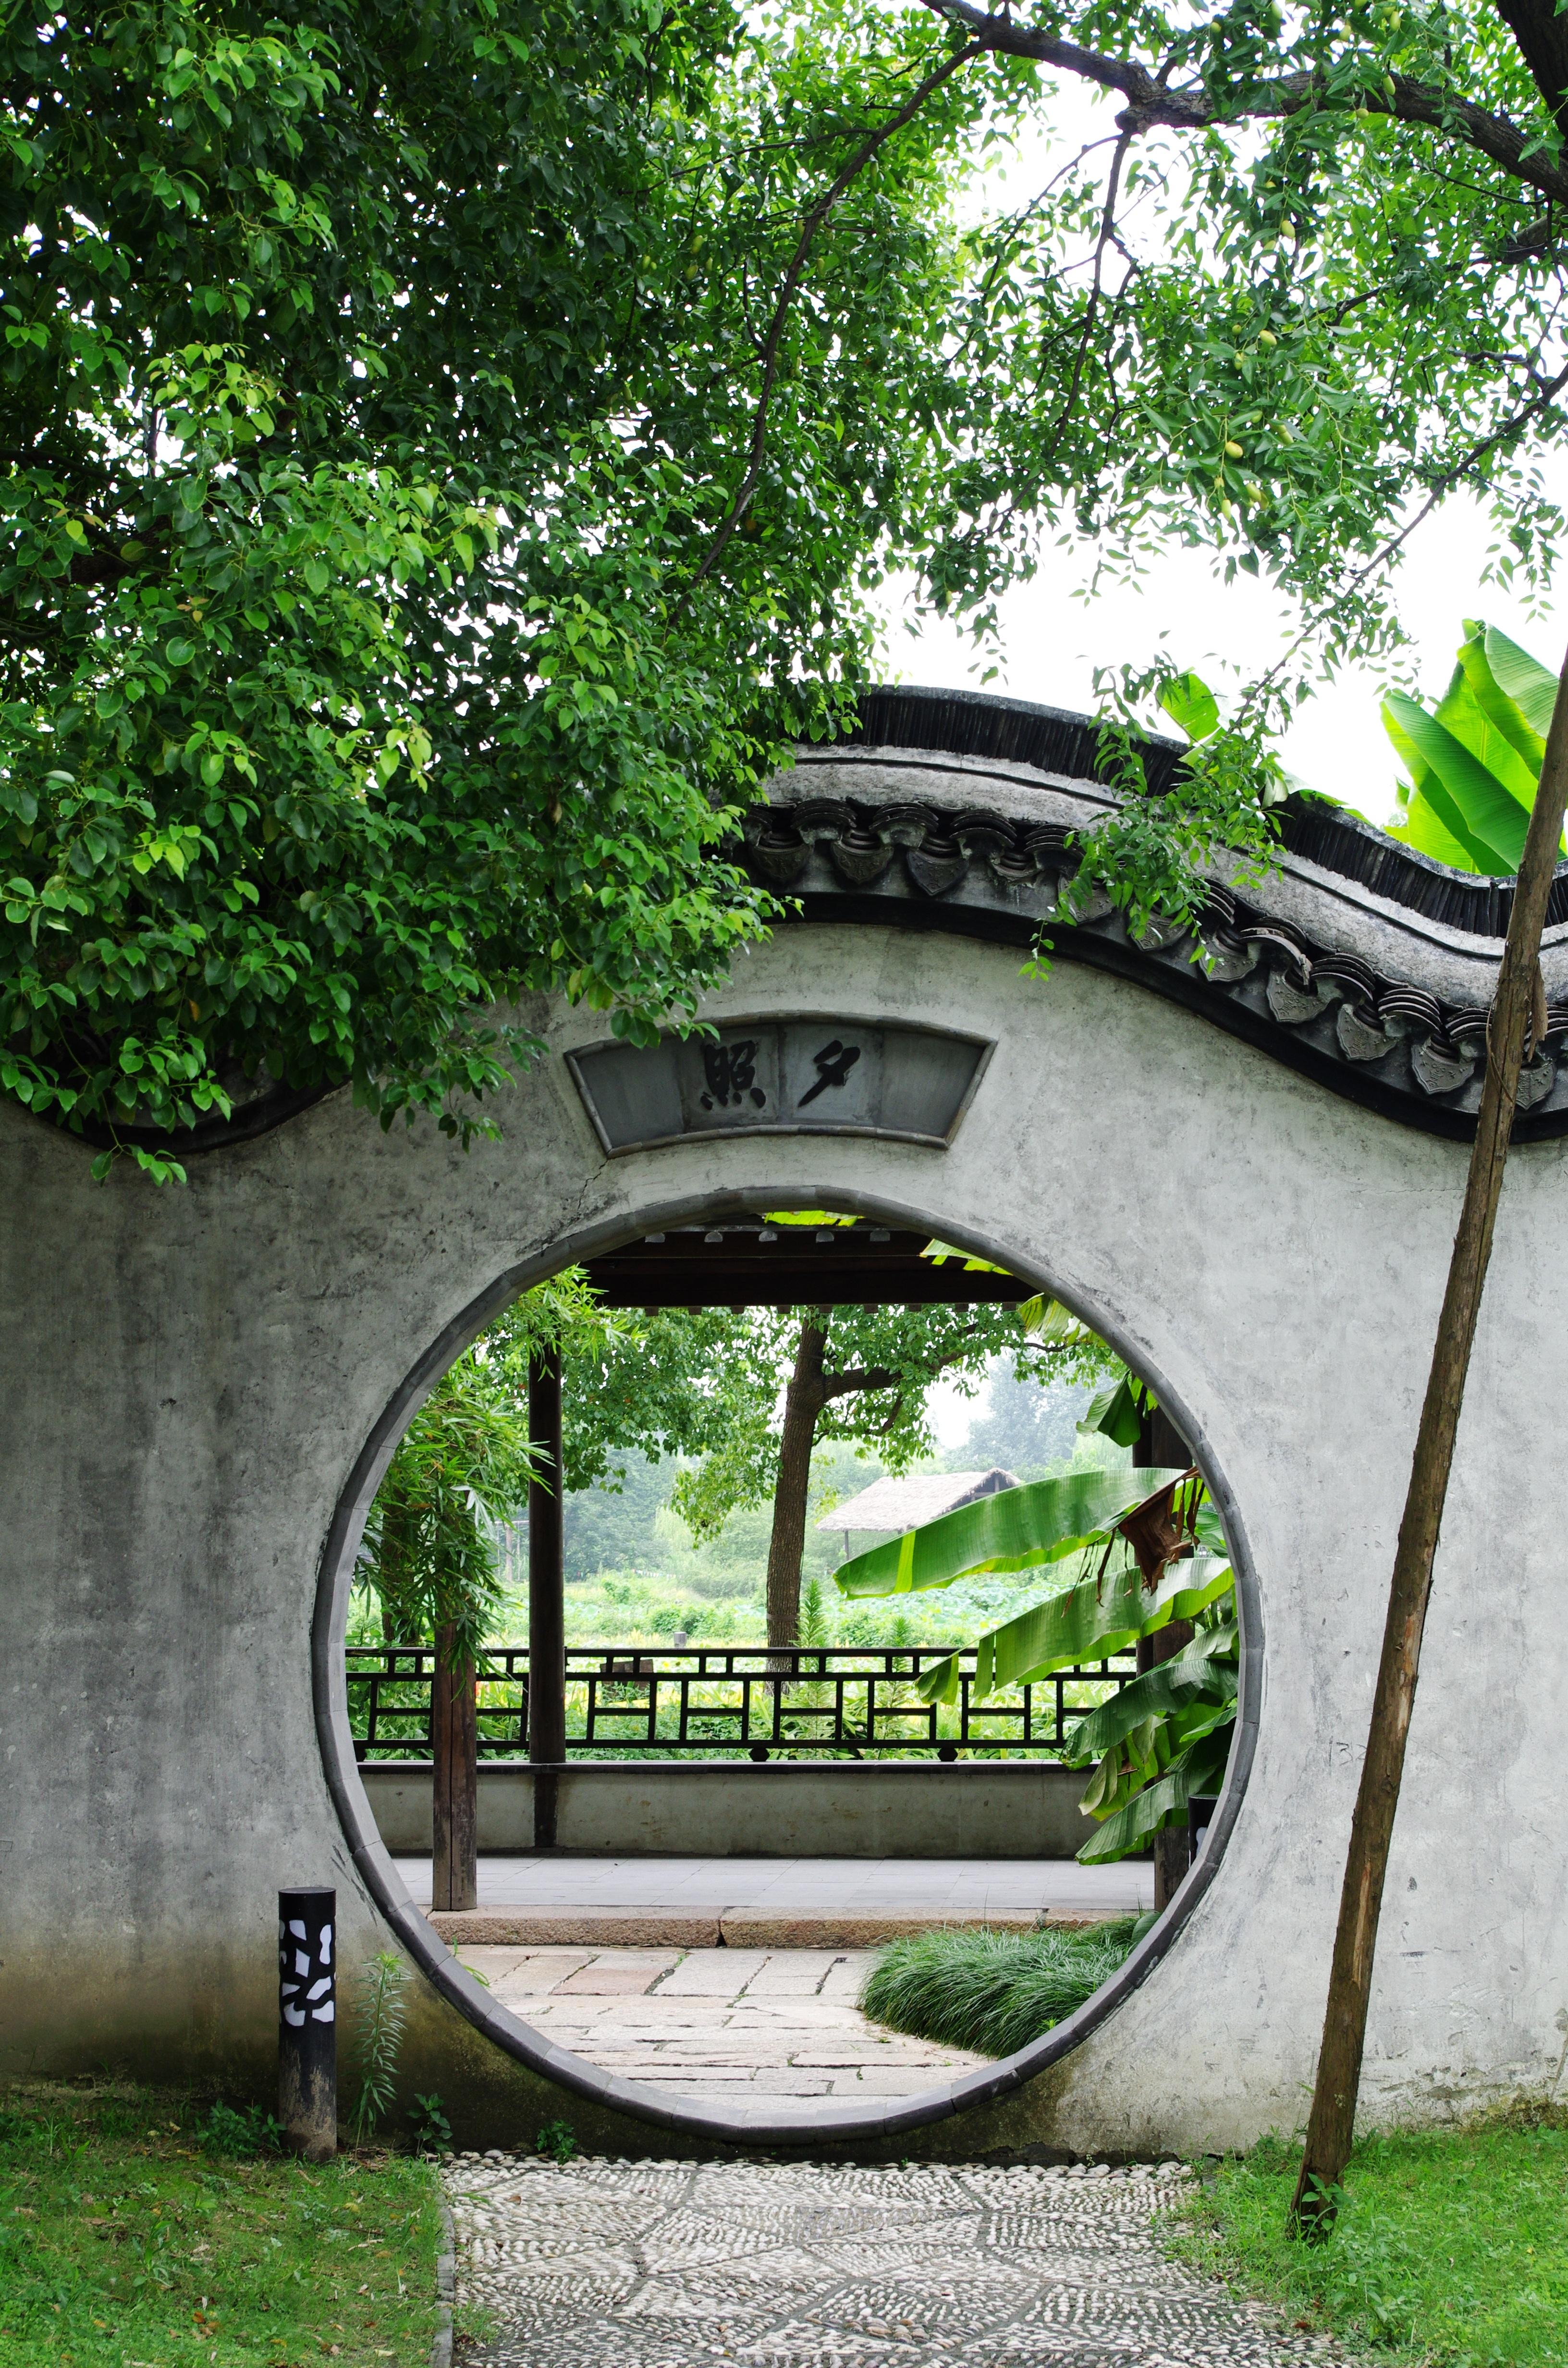 landschaft die architektur blume bogen grn hinterhof garten hof immobilien garten jiangnan china wind wuzhen - Hinterhof Landschaften Bilder